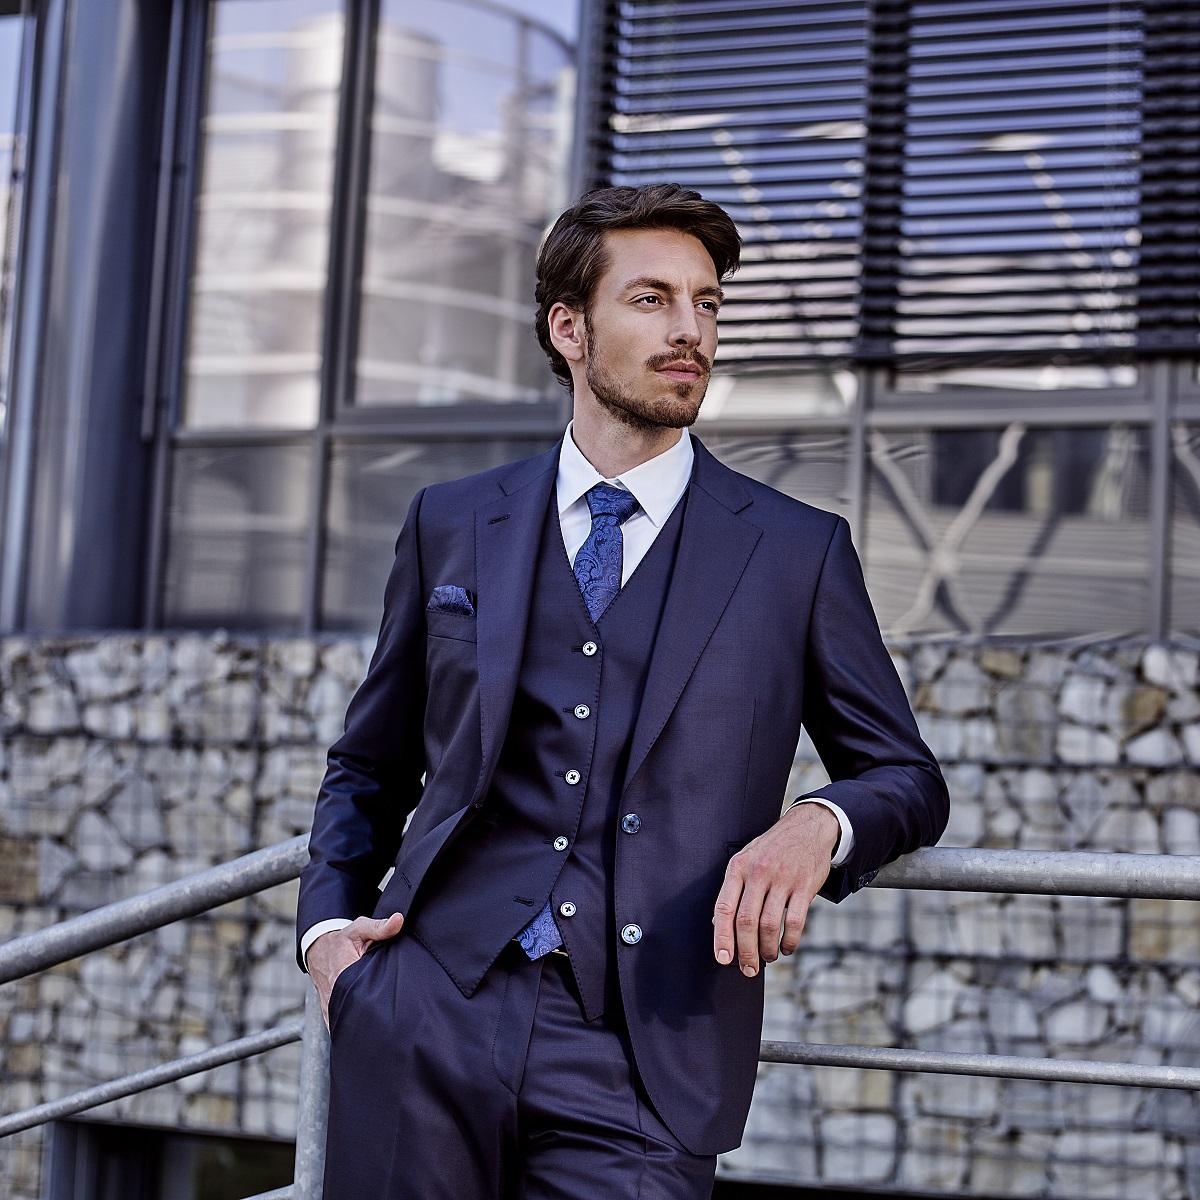 Mens Bespoke suit